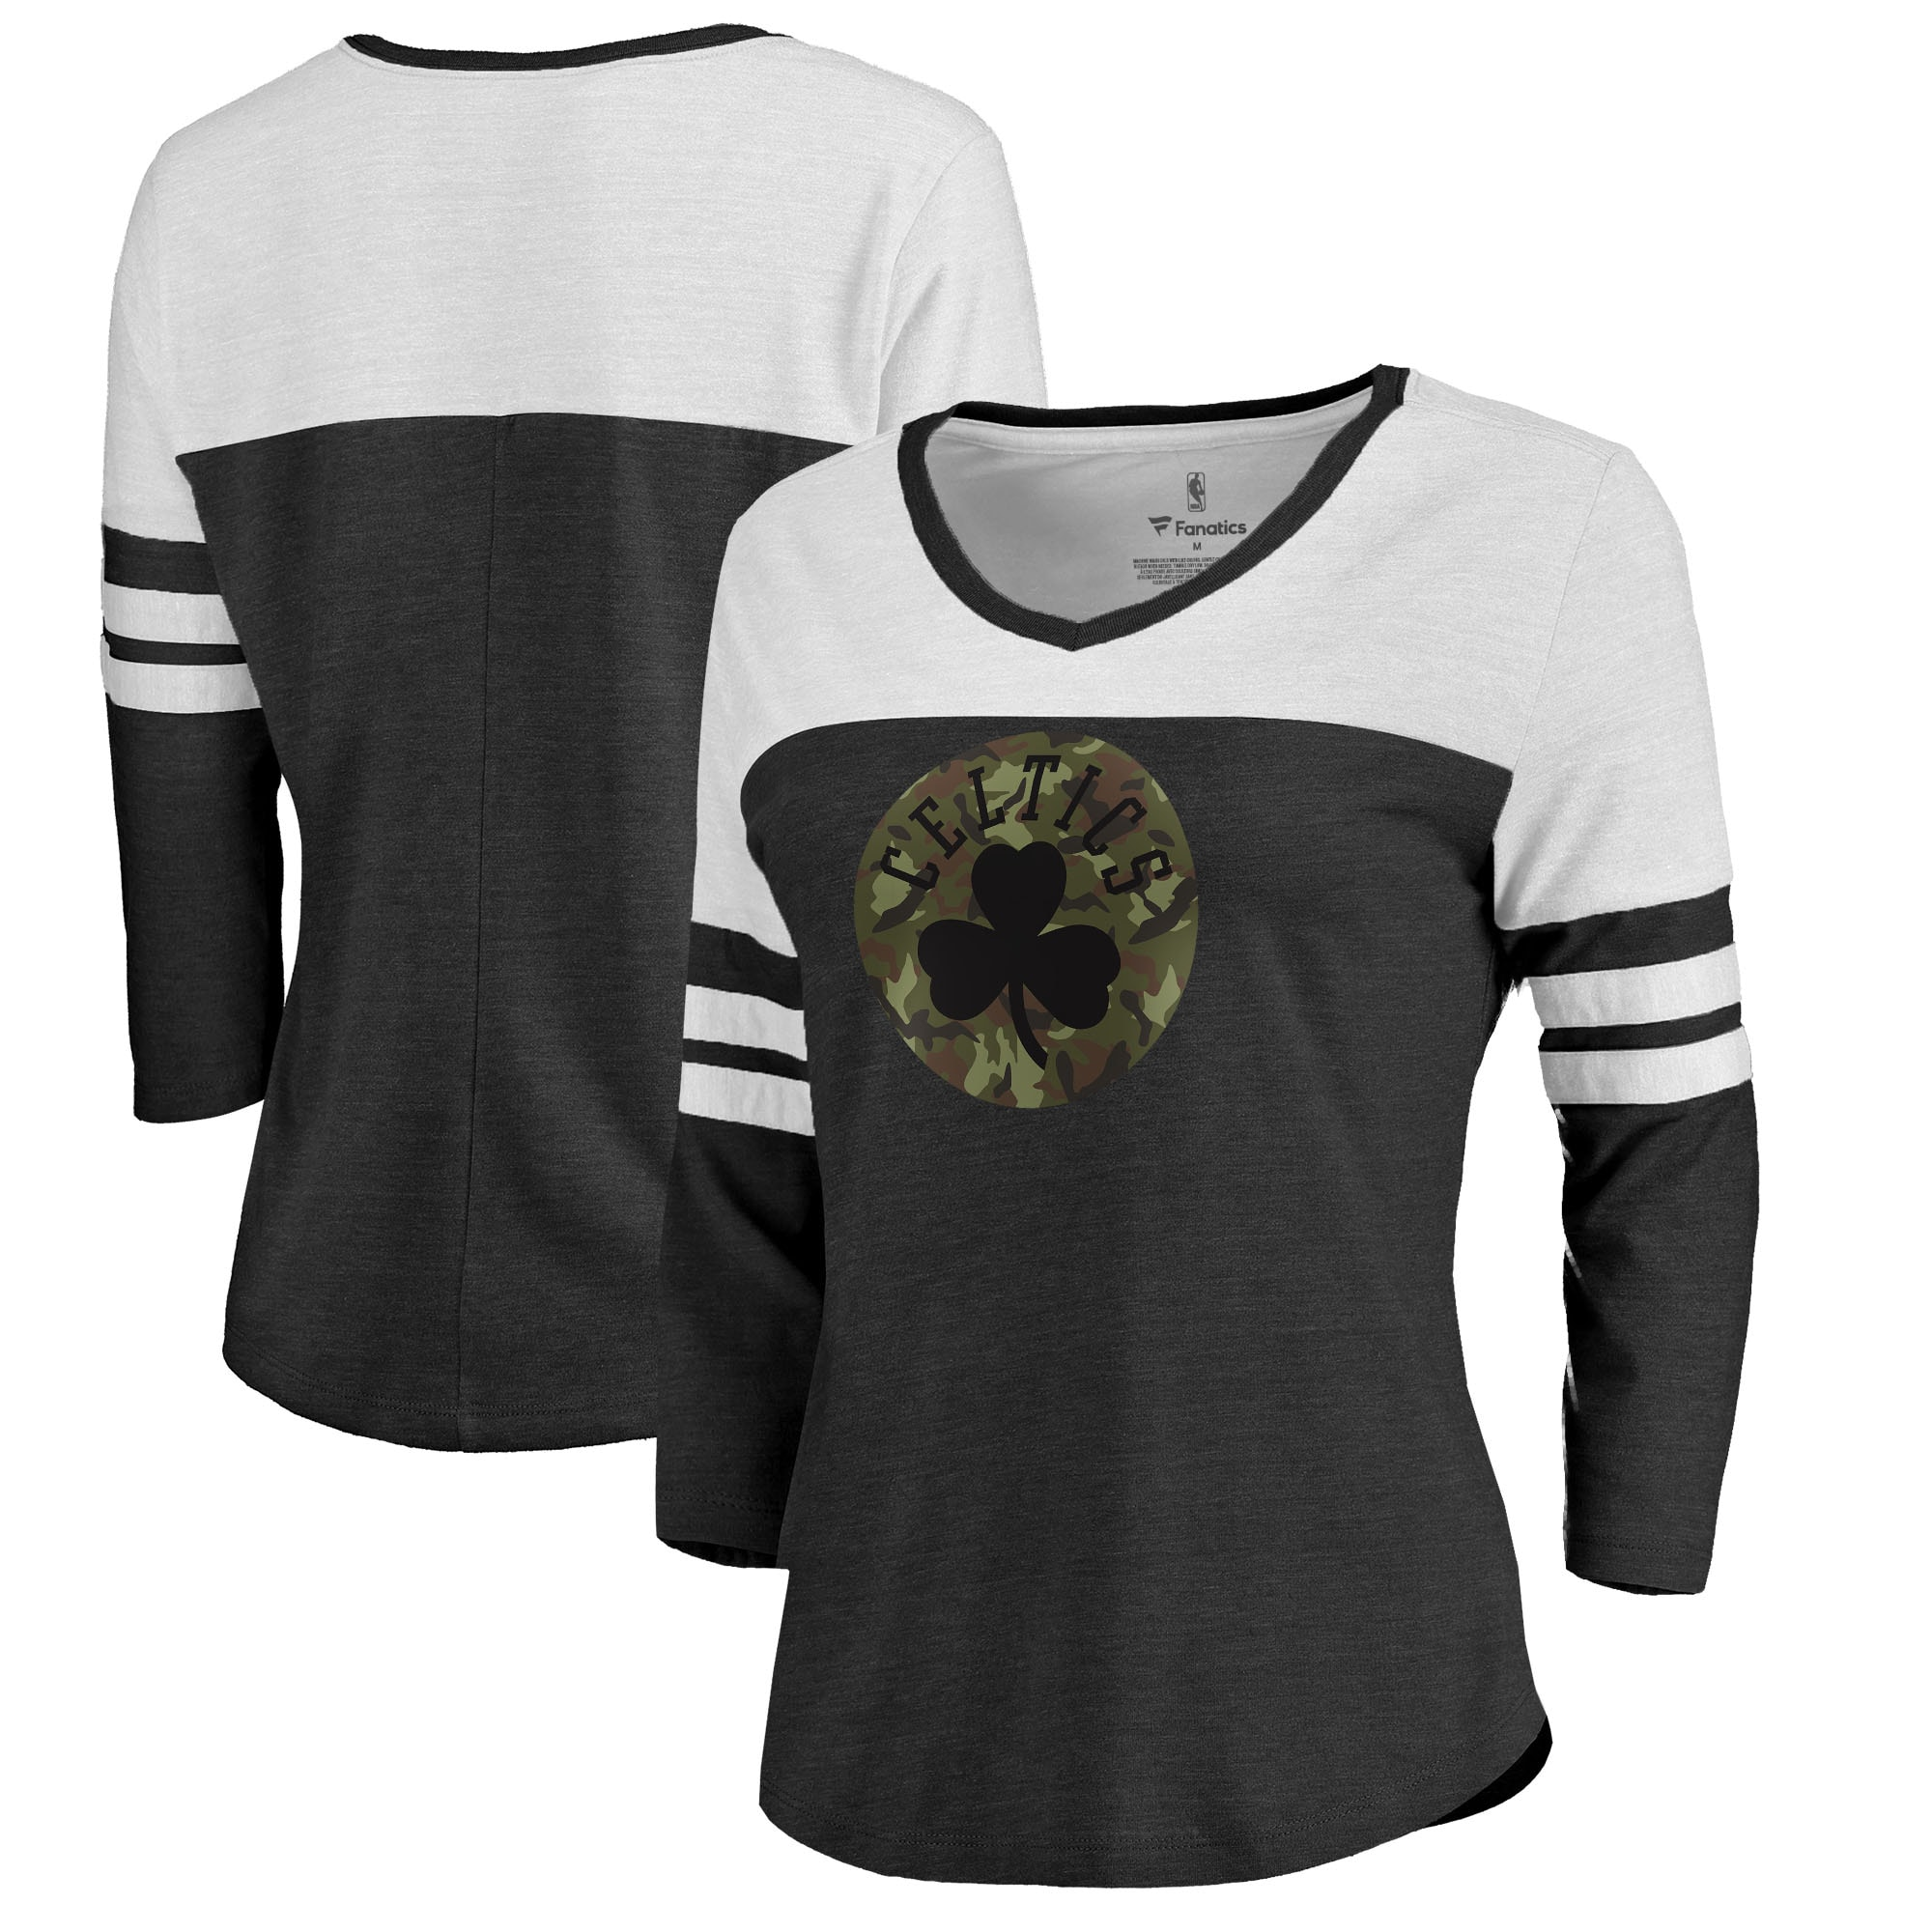 Boston Celtics Fanatics Branded Women's Prestige Camo 3/4-Sleeve Raglan T-Shirt - Black